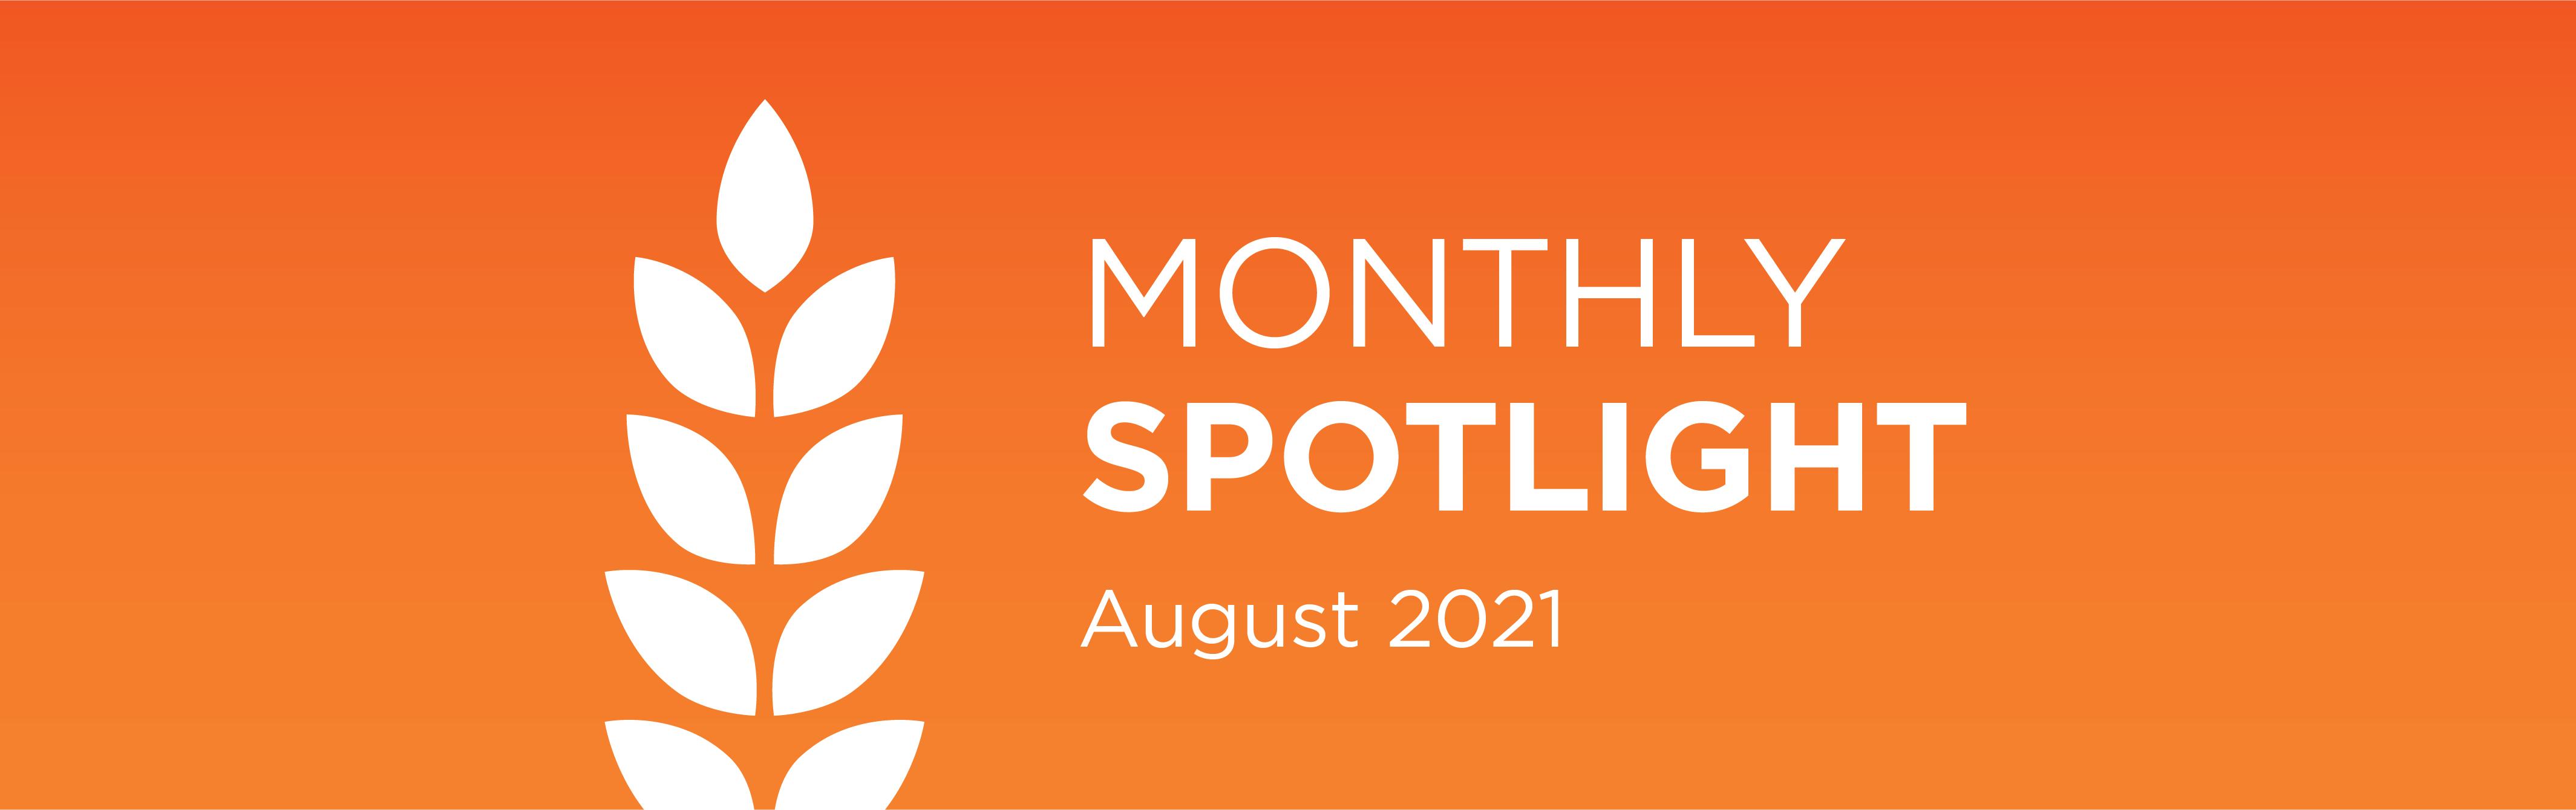 Feeding South Florida's Monthly Spotlight: August